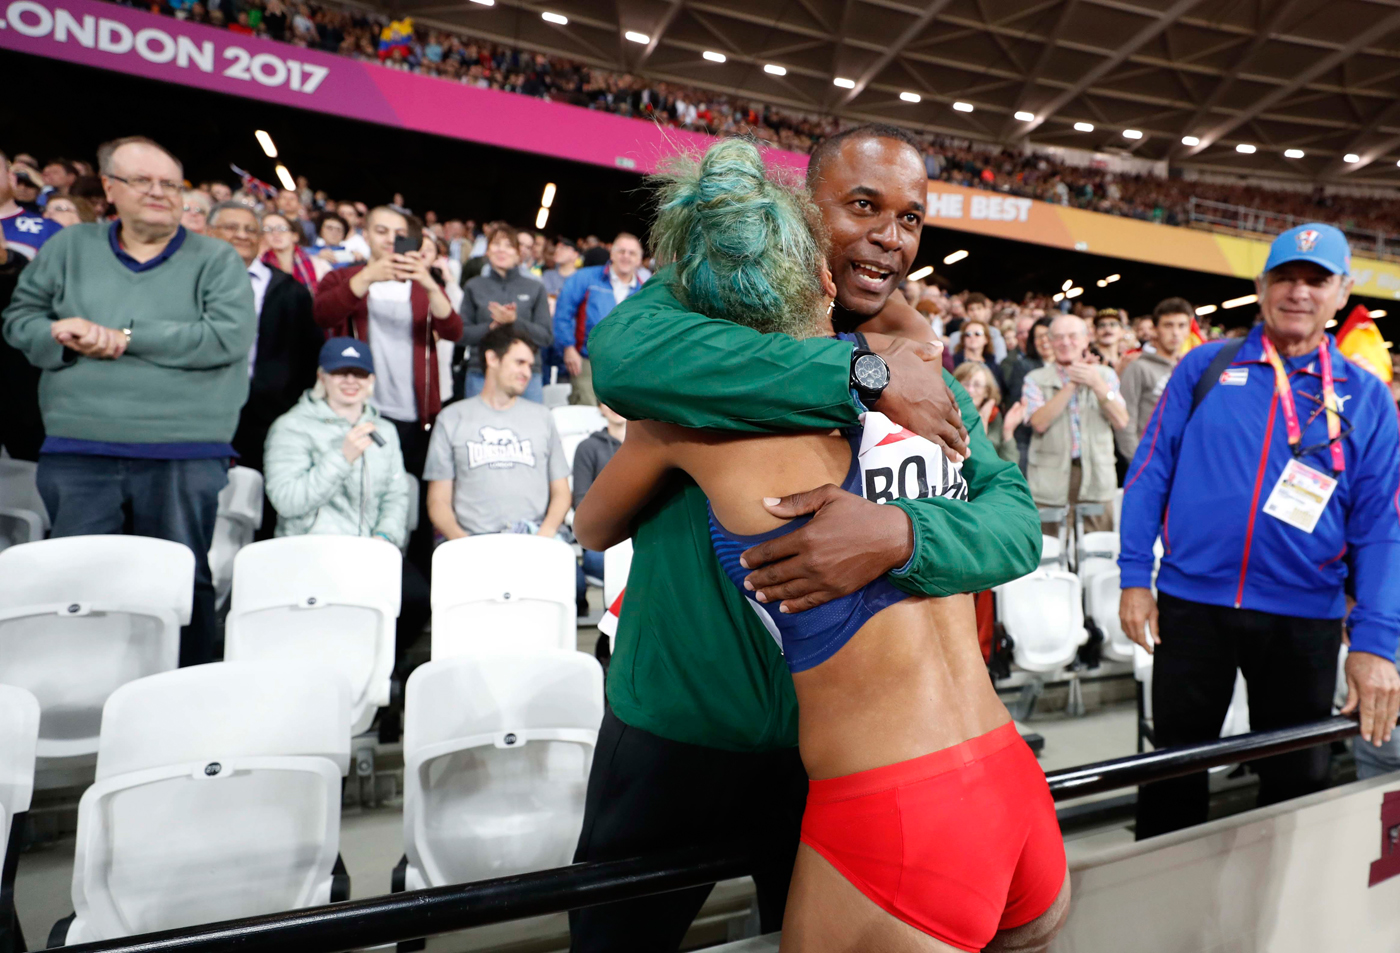 Athletics - World Athletics Championships - Women's Triple Jump Final – London Stadium, London, Britain - August 7, 2017. Yulimar Rojas of Venezuela celebrates winning gold with her coach. REUTERS/Phil Noble